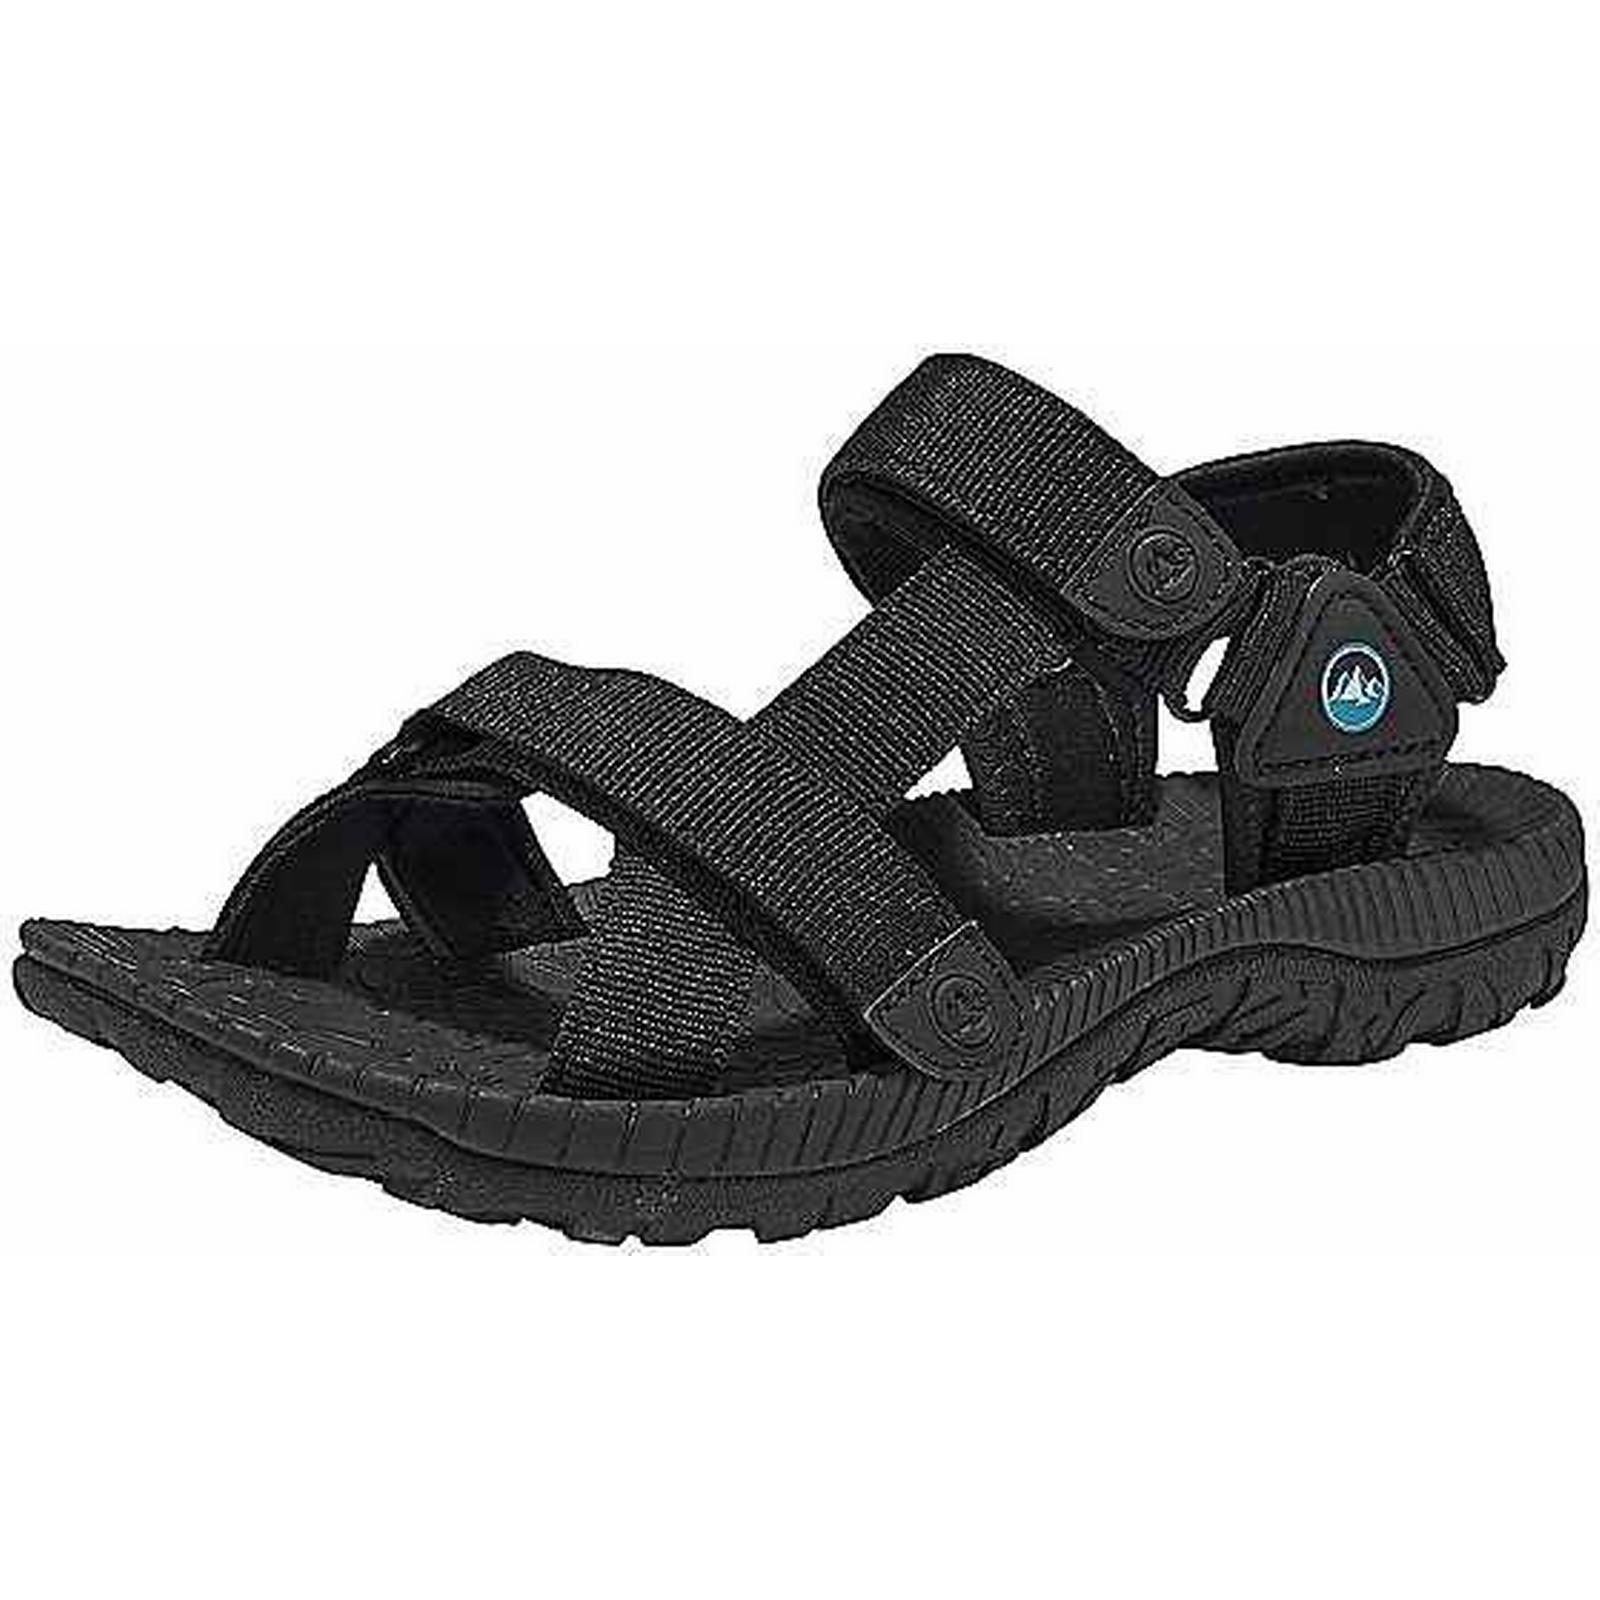 Gentleman/Lady:Polarino 'Breathe' Outdoor Sandals:Direct Sandals:Direct Outdoor Management cdc898